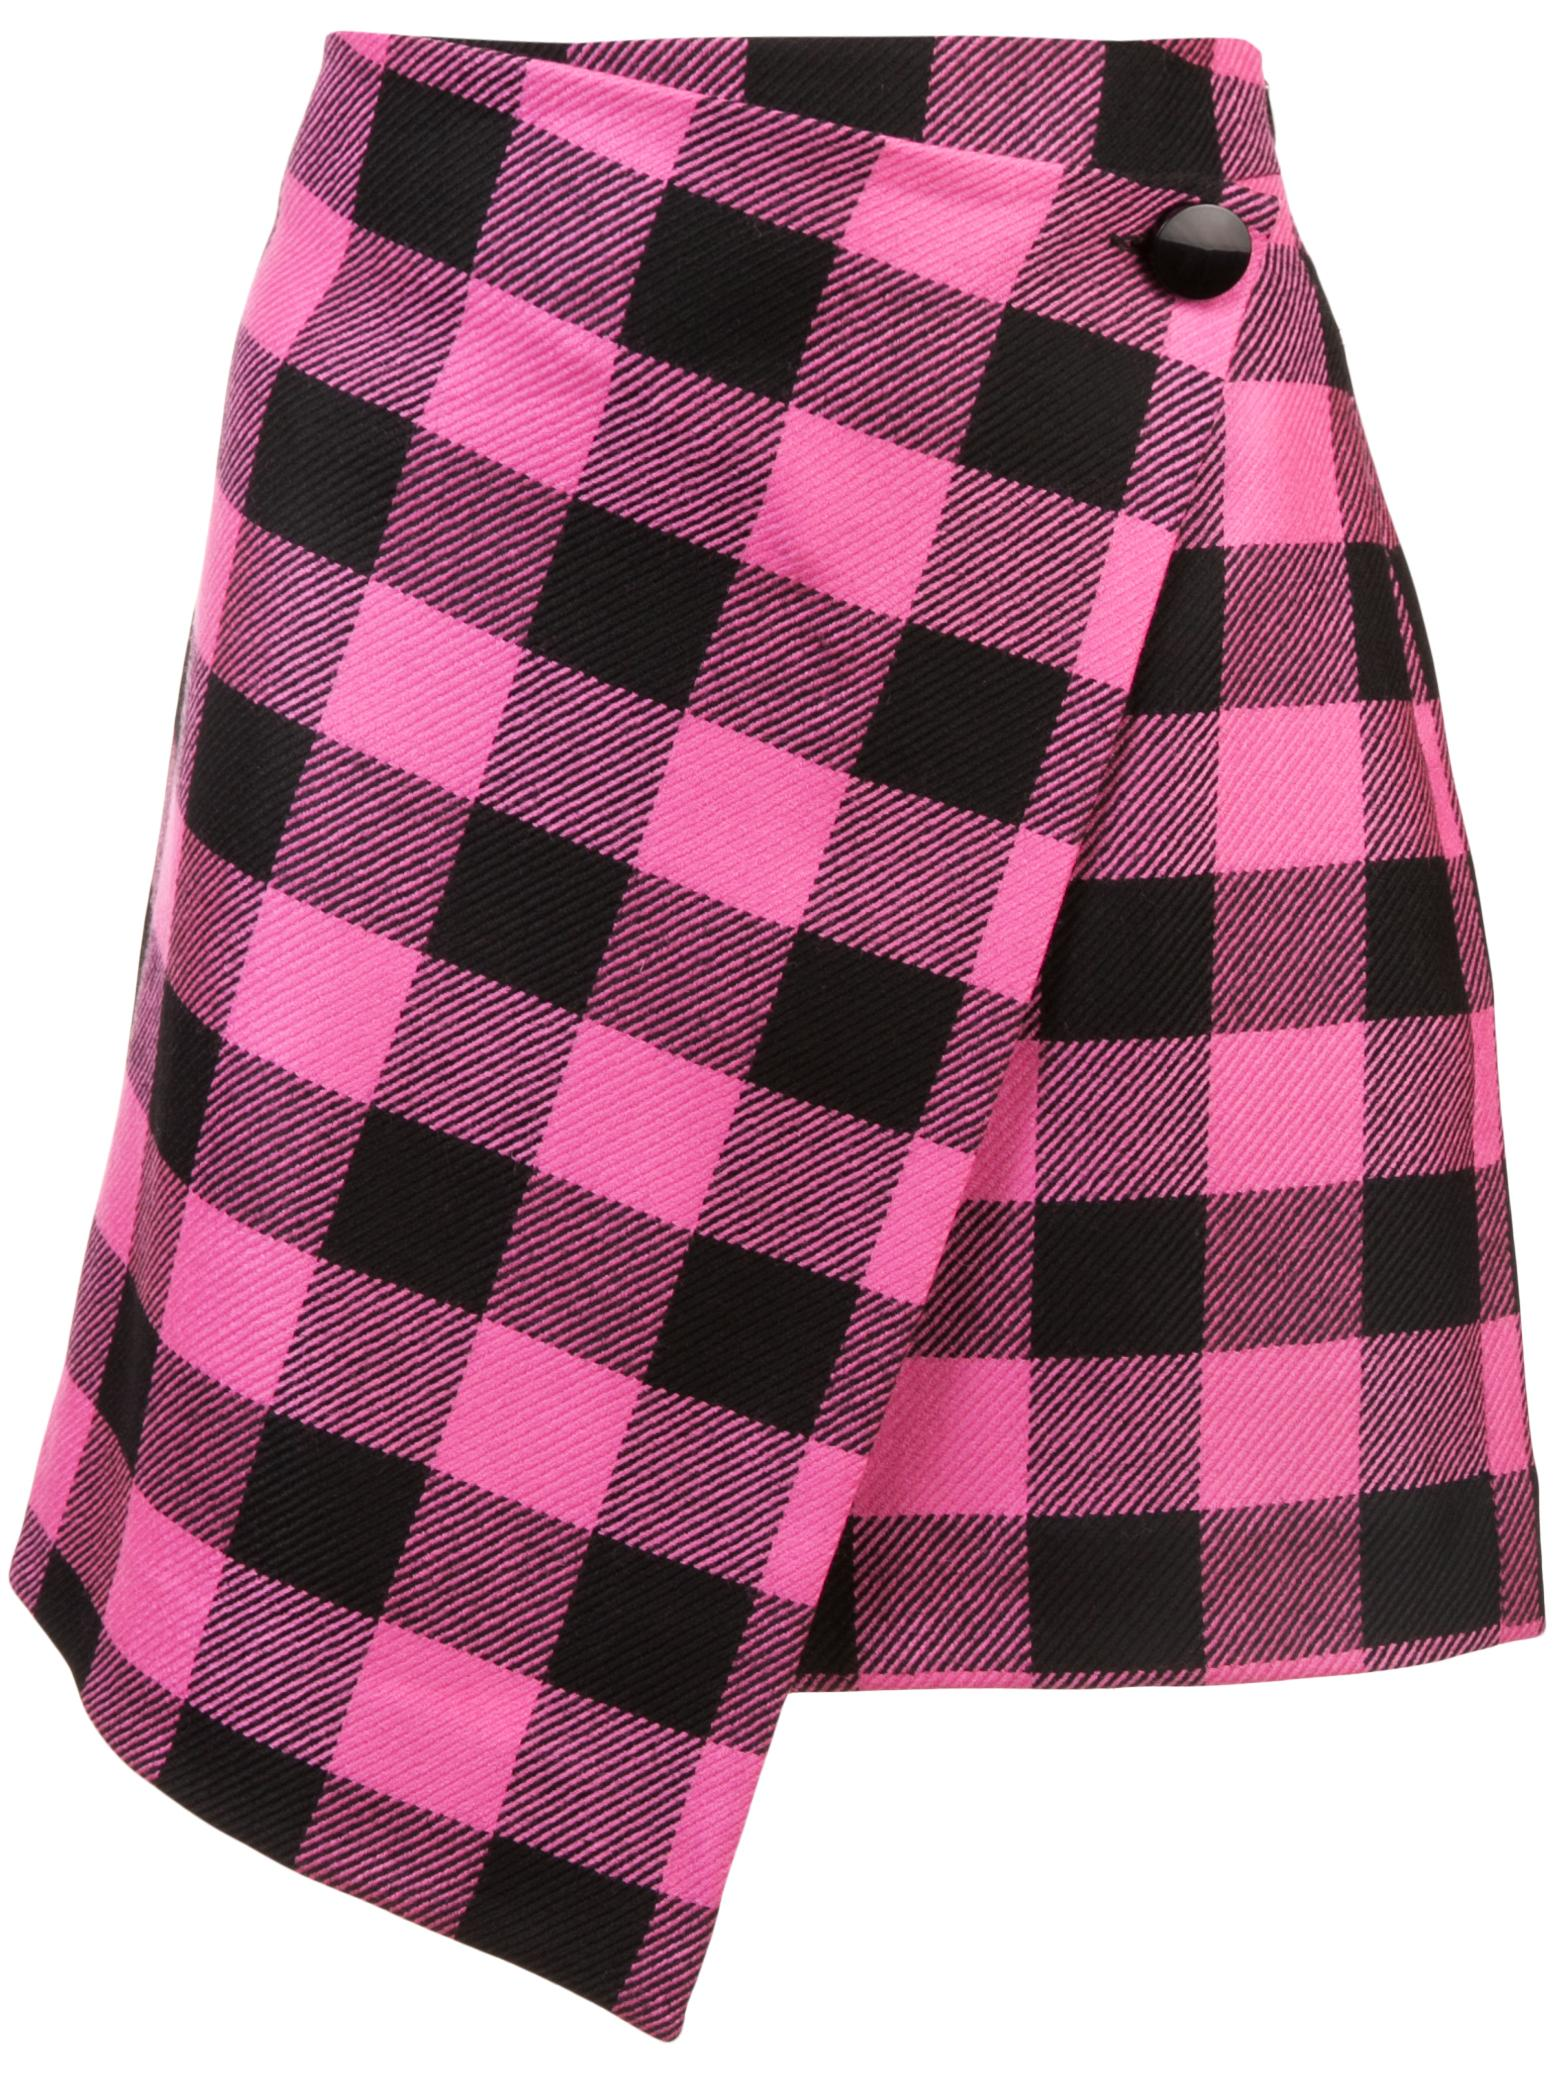 Buffalo Check Wrap Mini Skirt